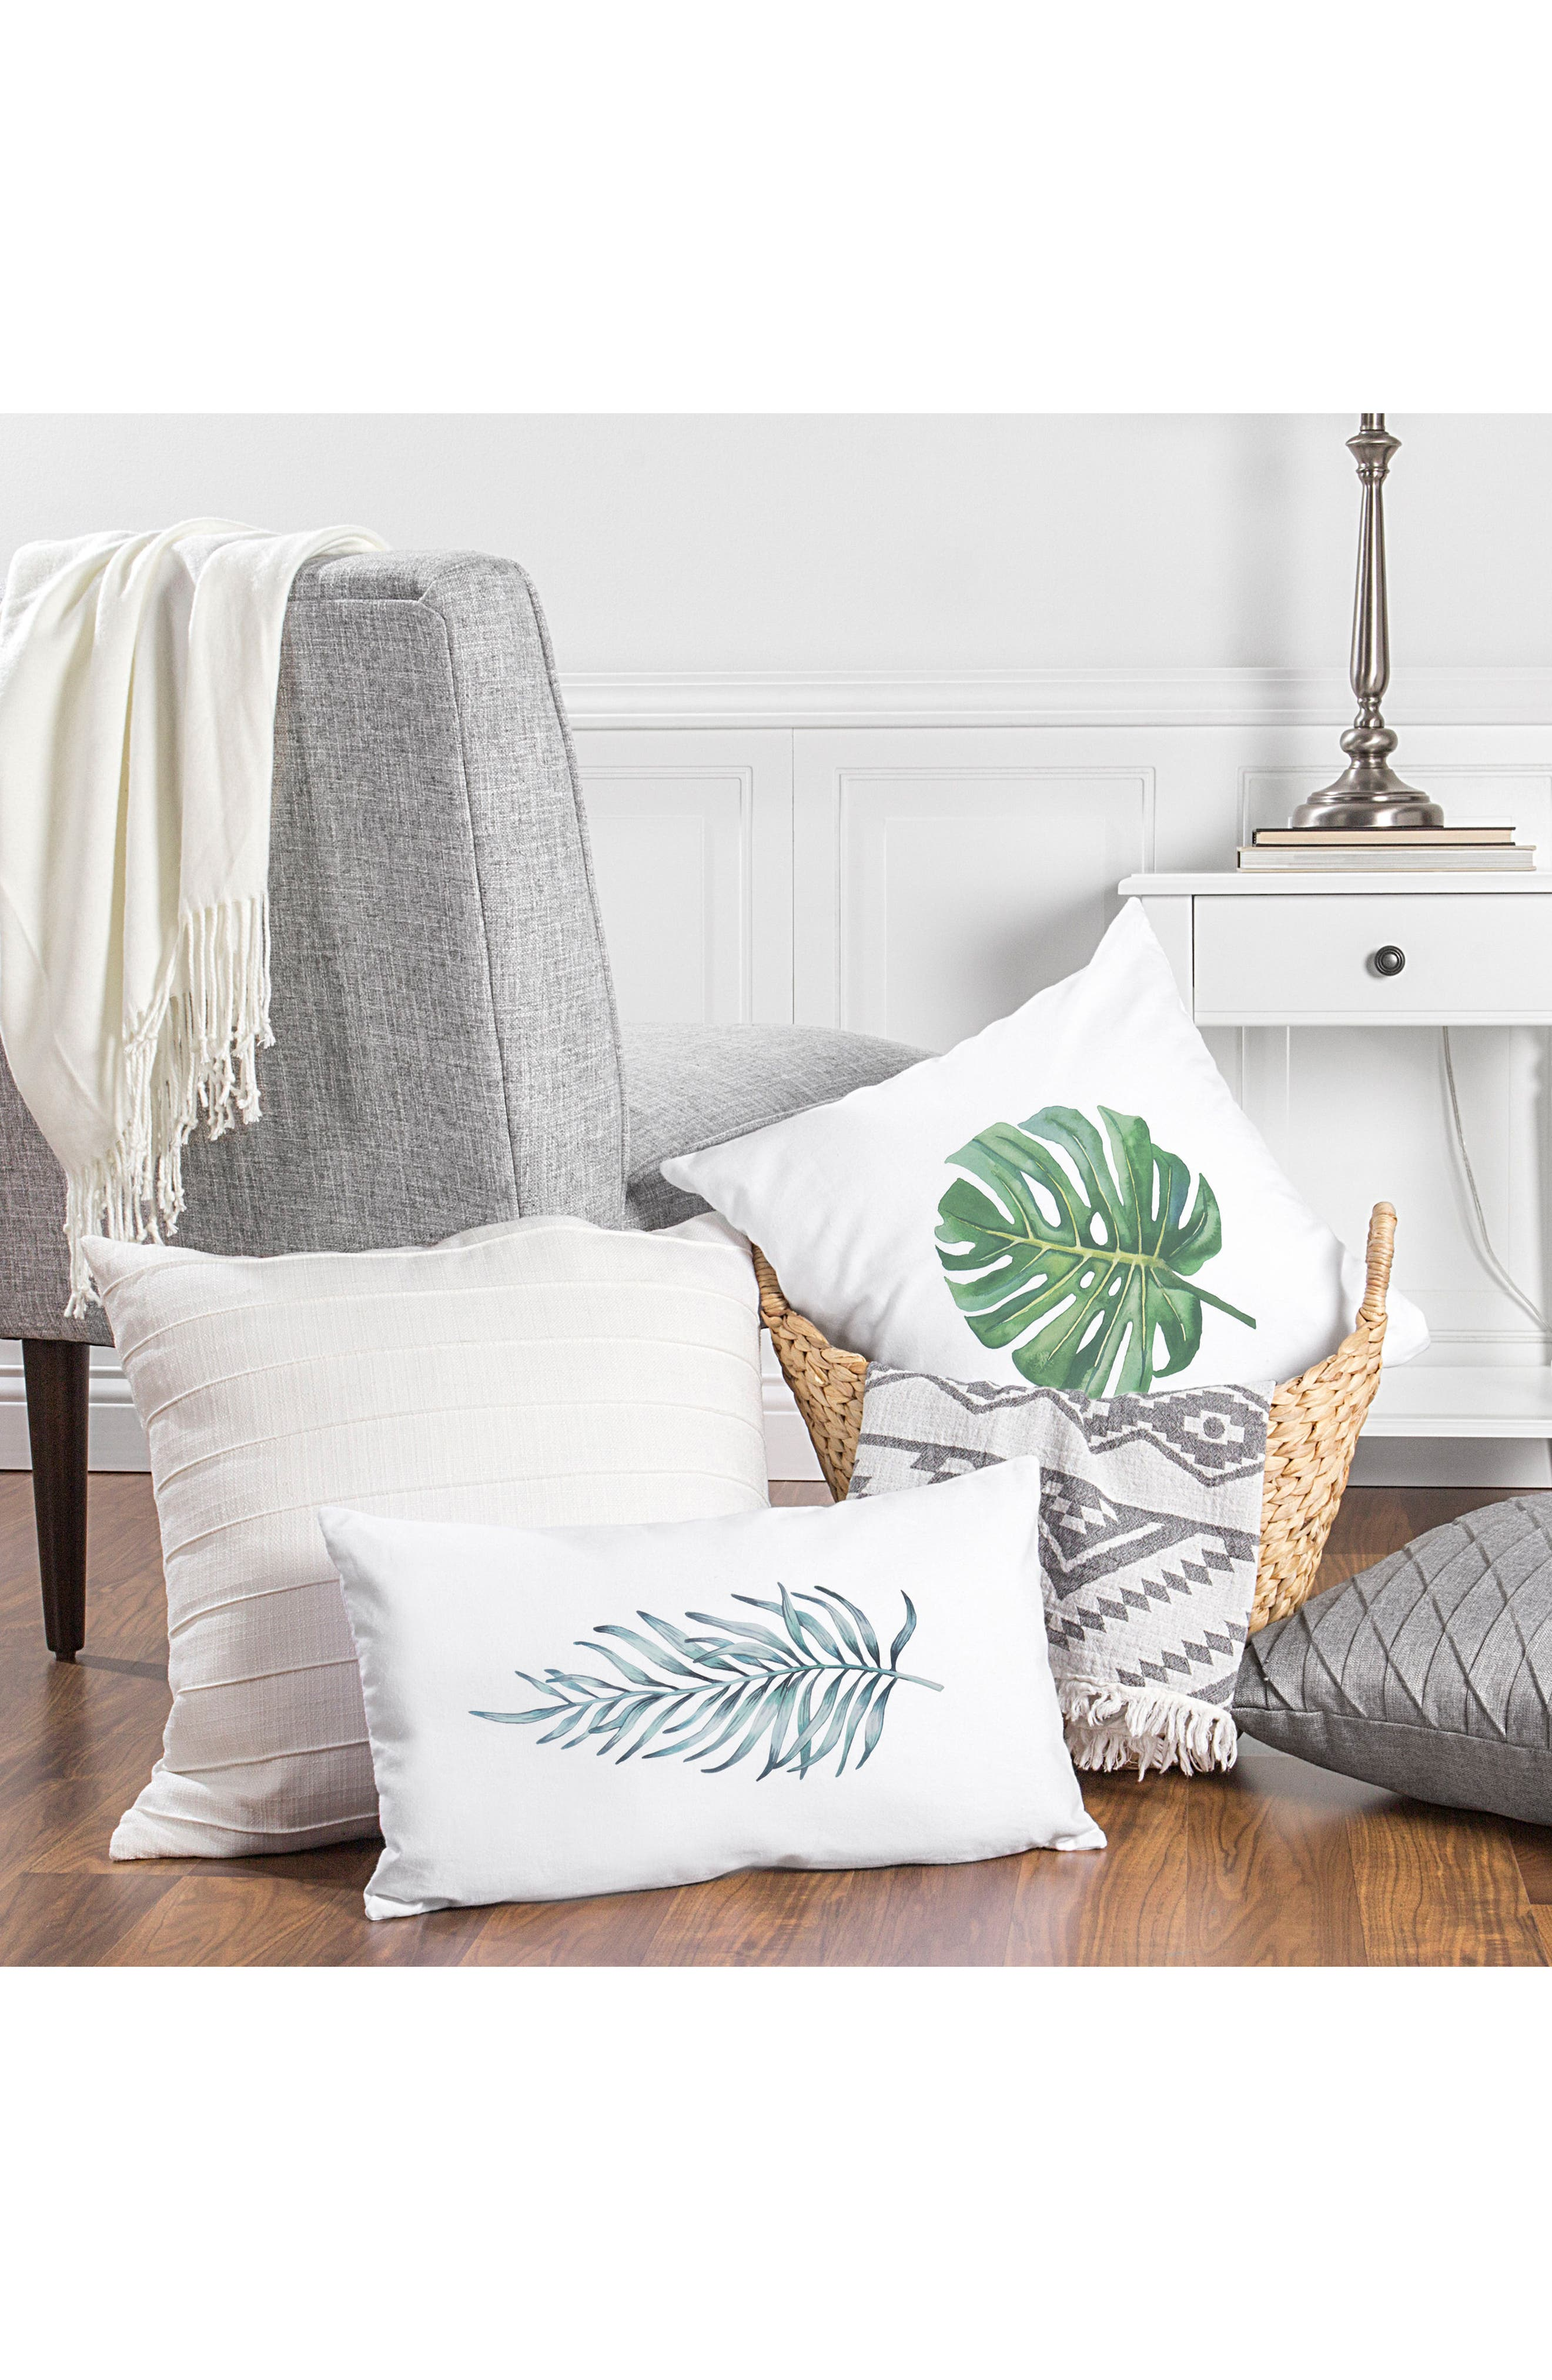 Palm Leaf Lumbar Accent Pillow,                             Alternate thumbnail 7, color,                             300